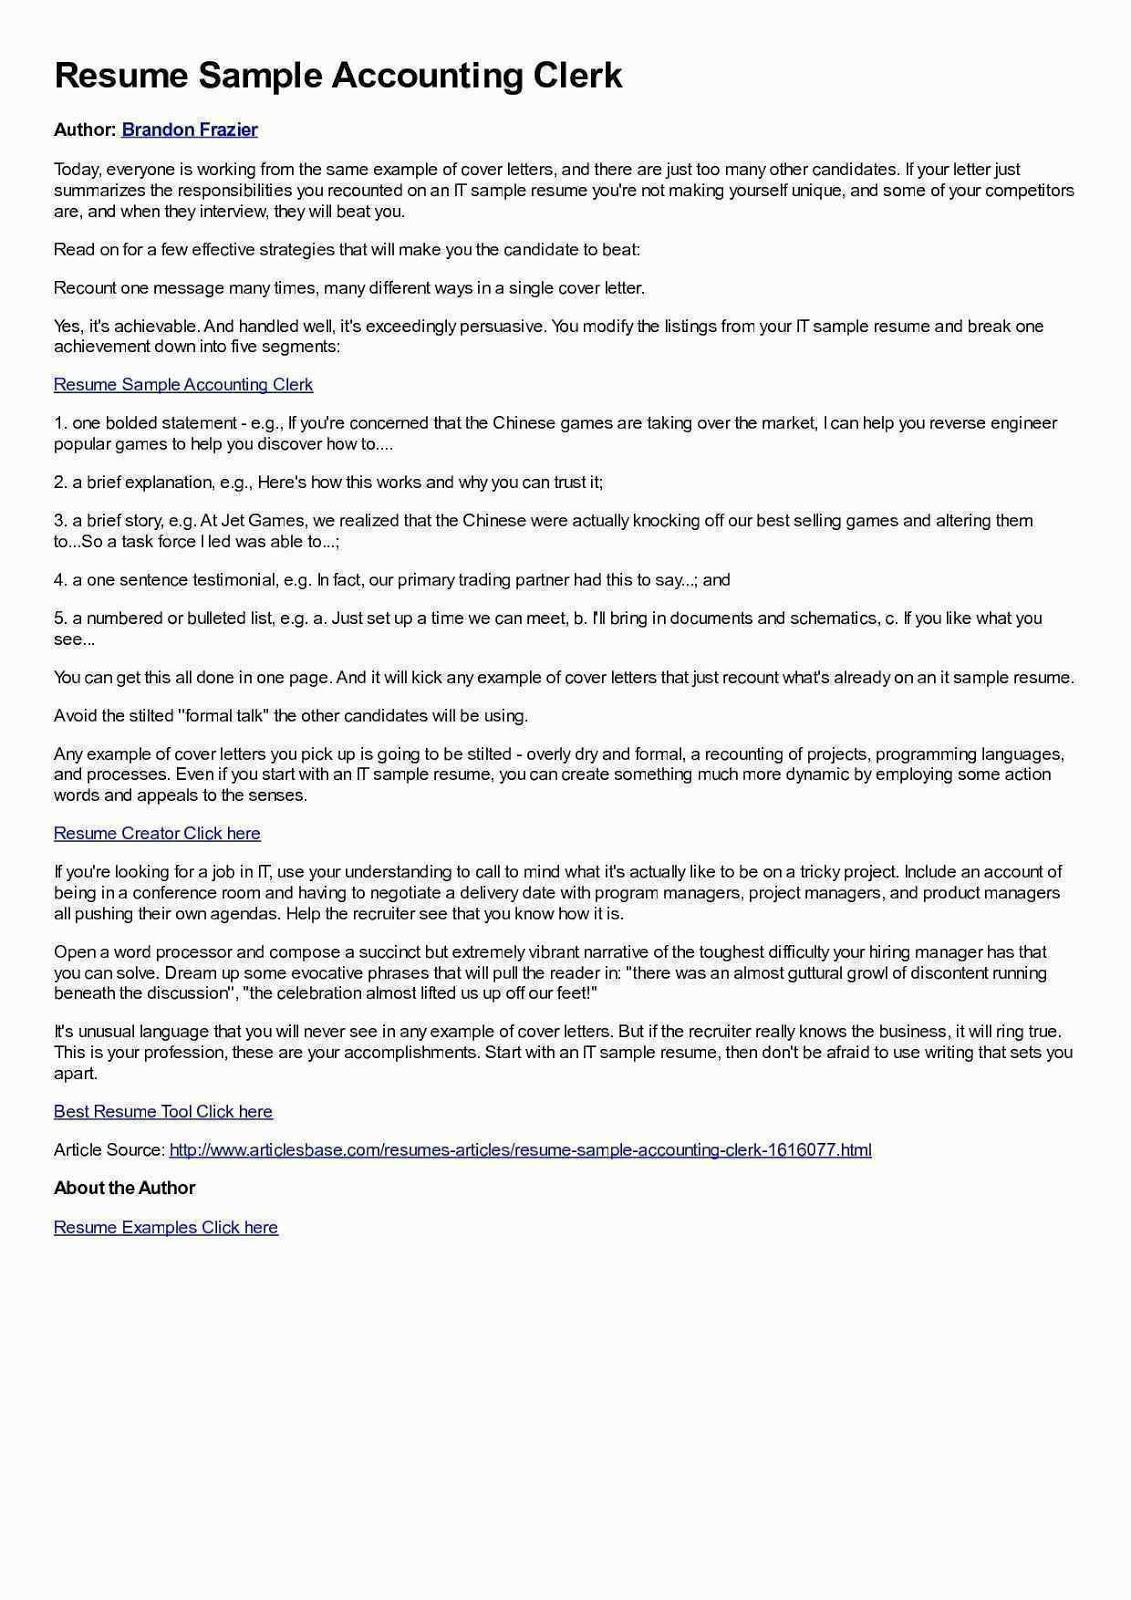 accounting clerk resume sample accounting clerk resume samples canada accounting clerk resume example accounting clerk functional resume sample accounting clerk job resume sample accounting payable clerk resume sample accounts receivable clerk resume sample entry level accounting clerk resume sample junior accounting clerk sample resume accounts payable clerk resume example canada best sample accounting clerk resume